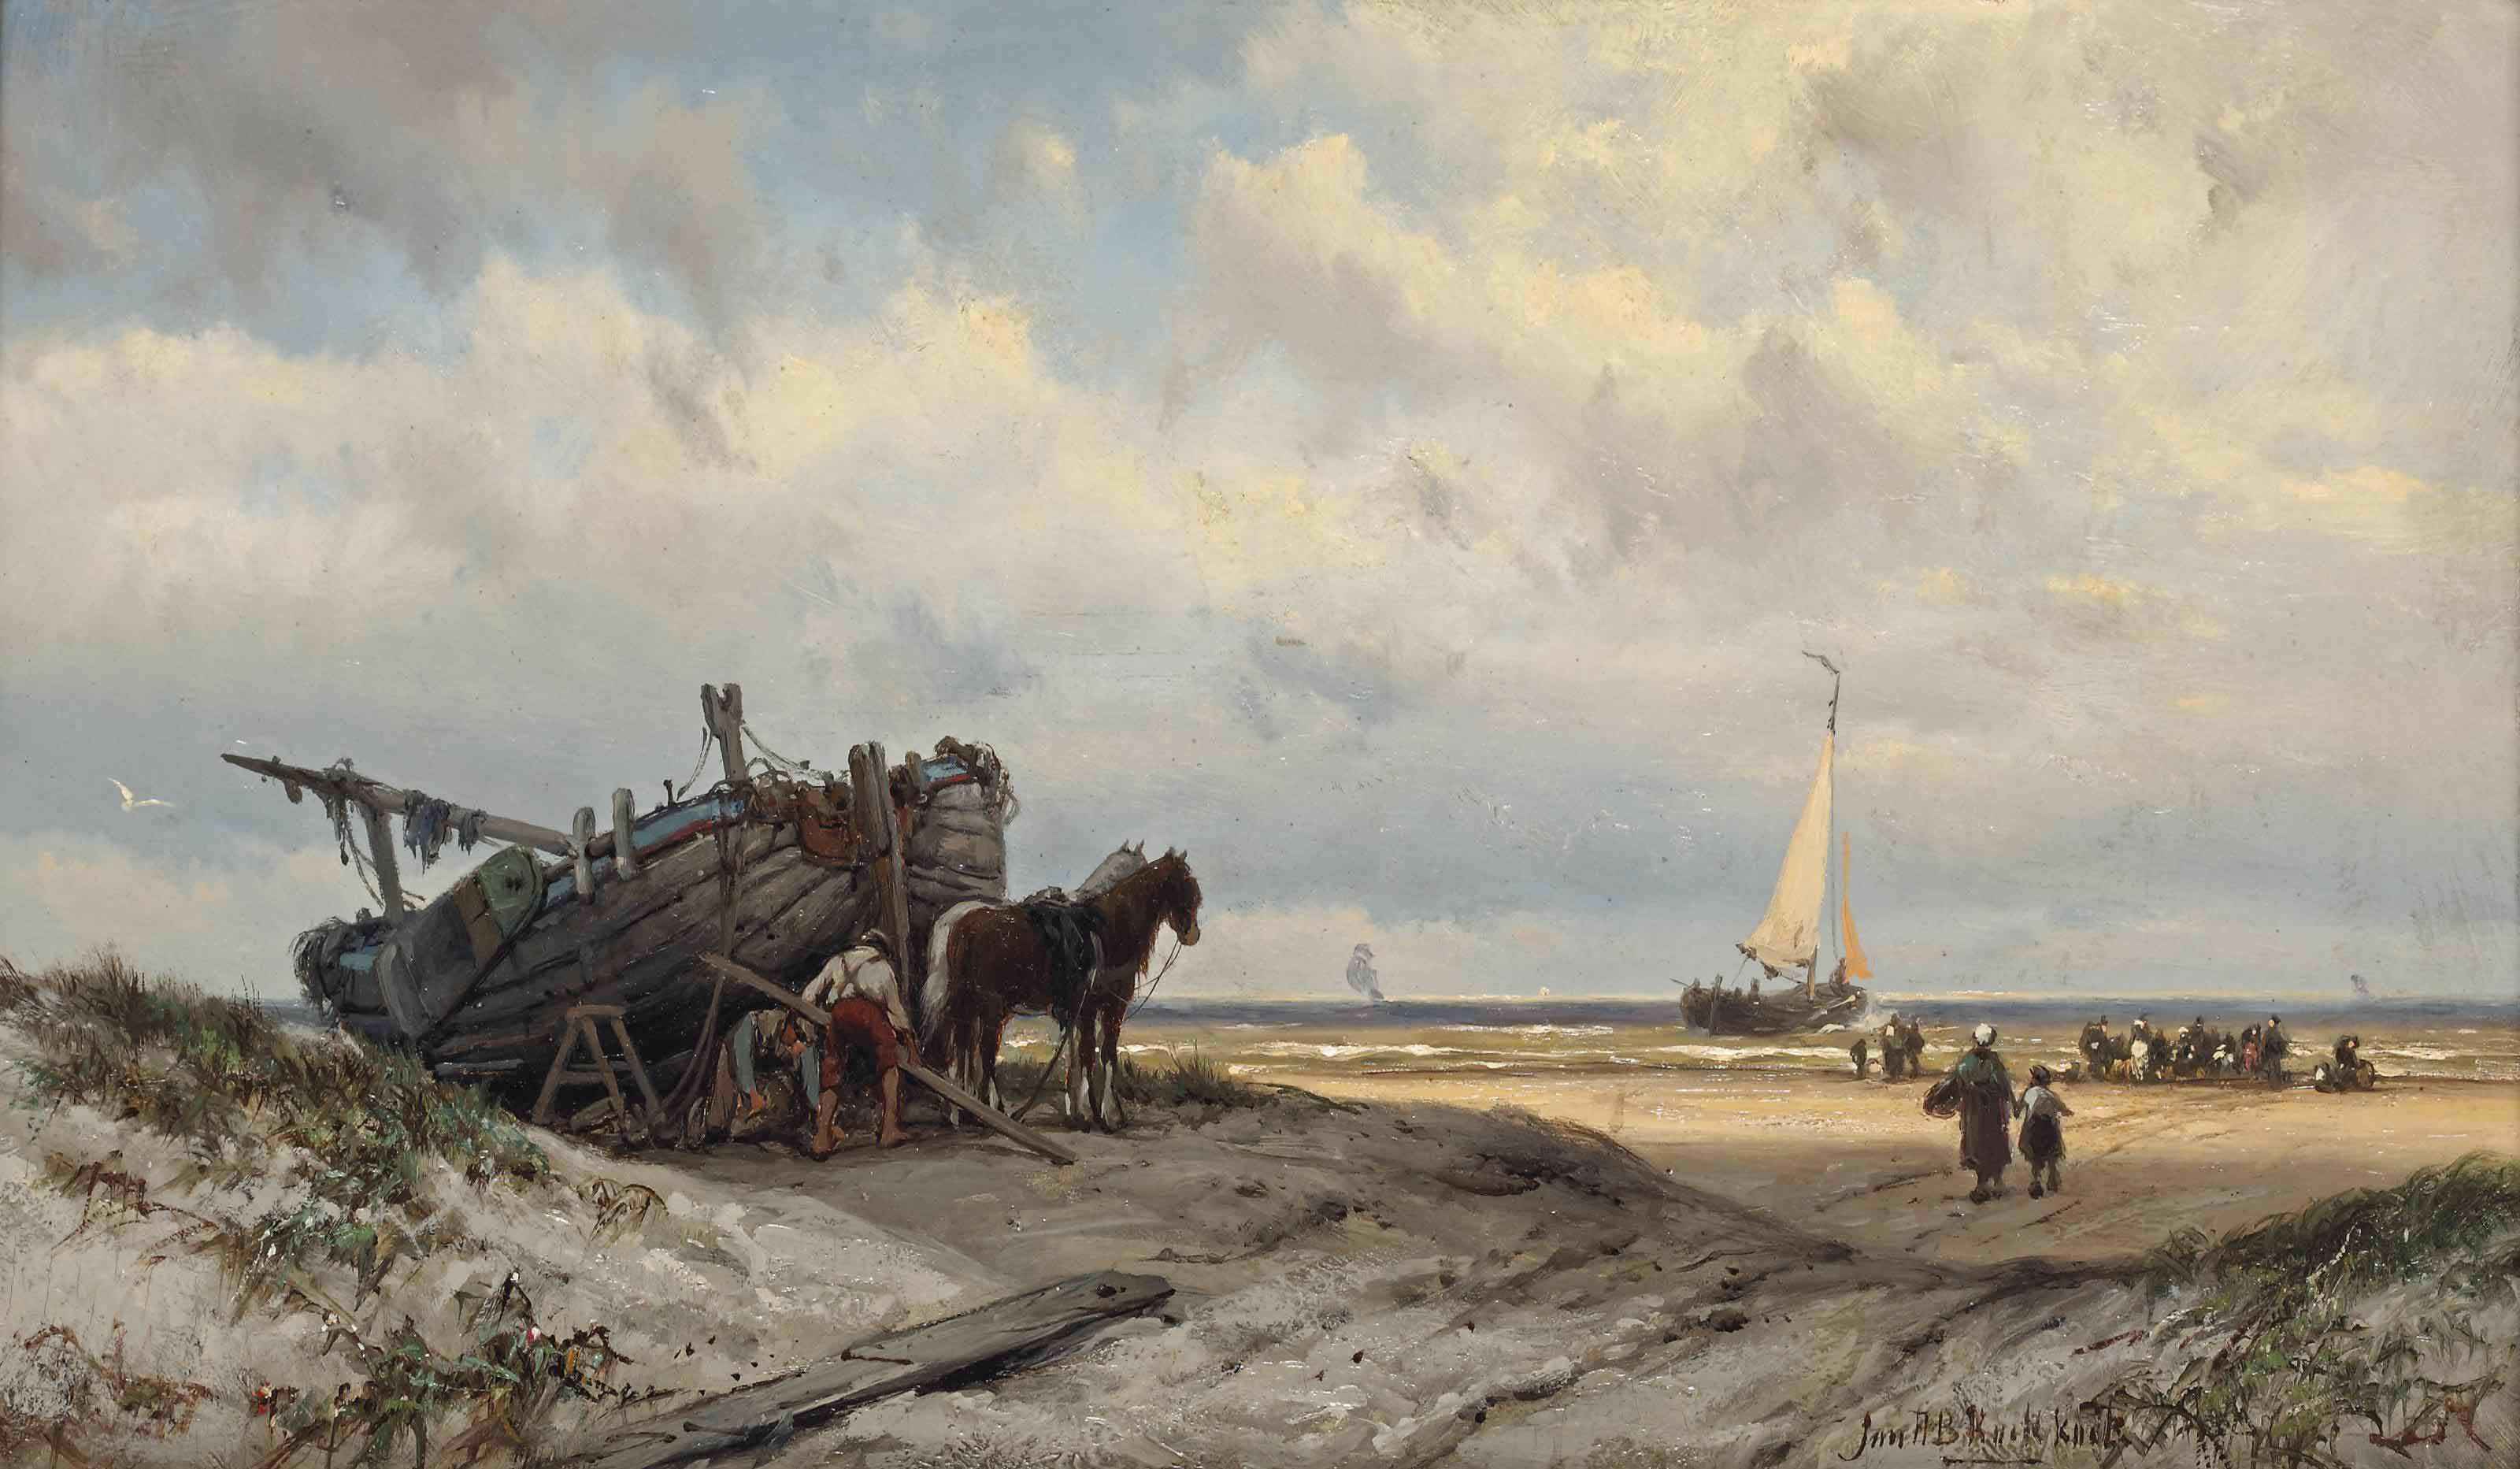 Repairing the vessel in the dunes